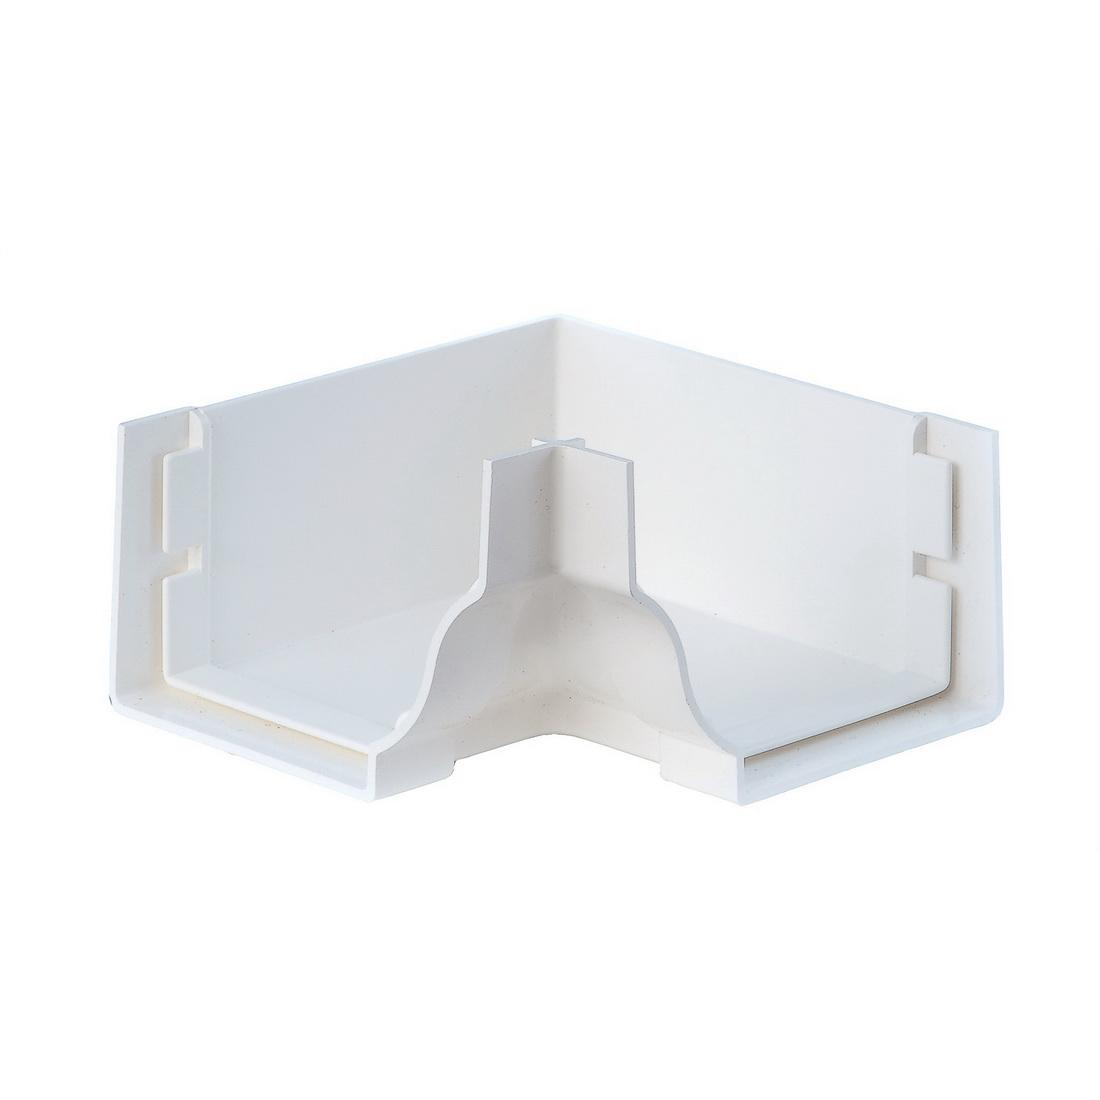 Marley Classic Internal Angle 150 x 150 x 90 mm 90 deg MC7